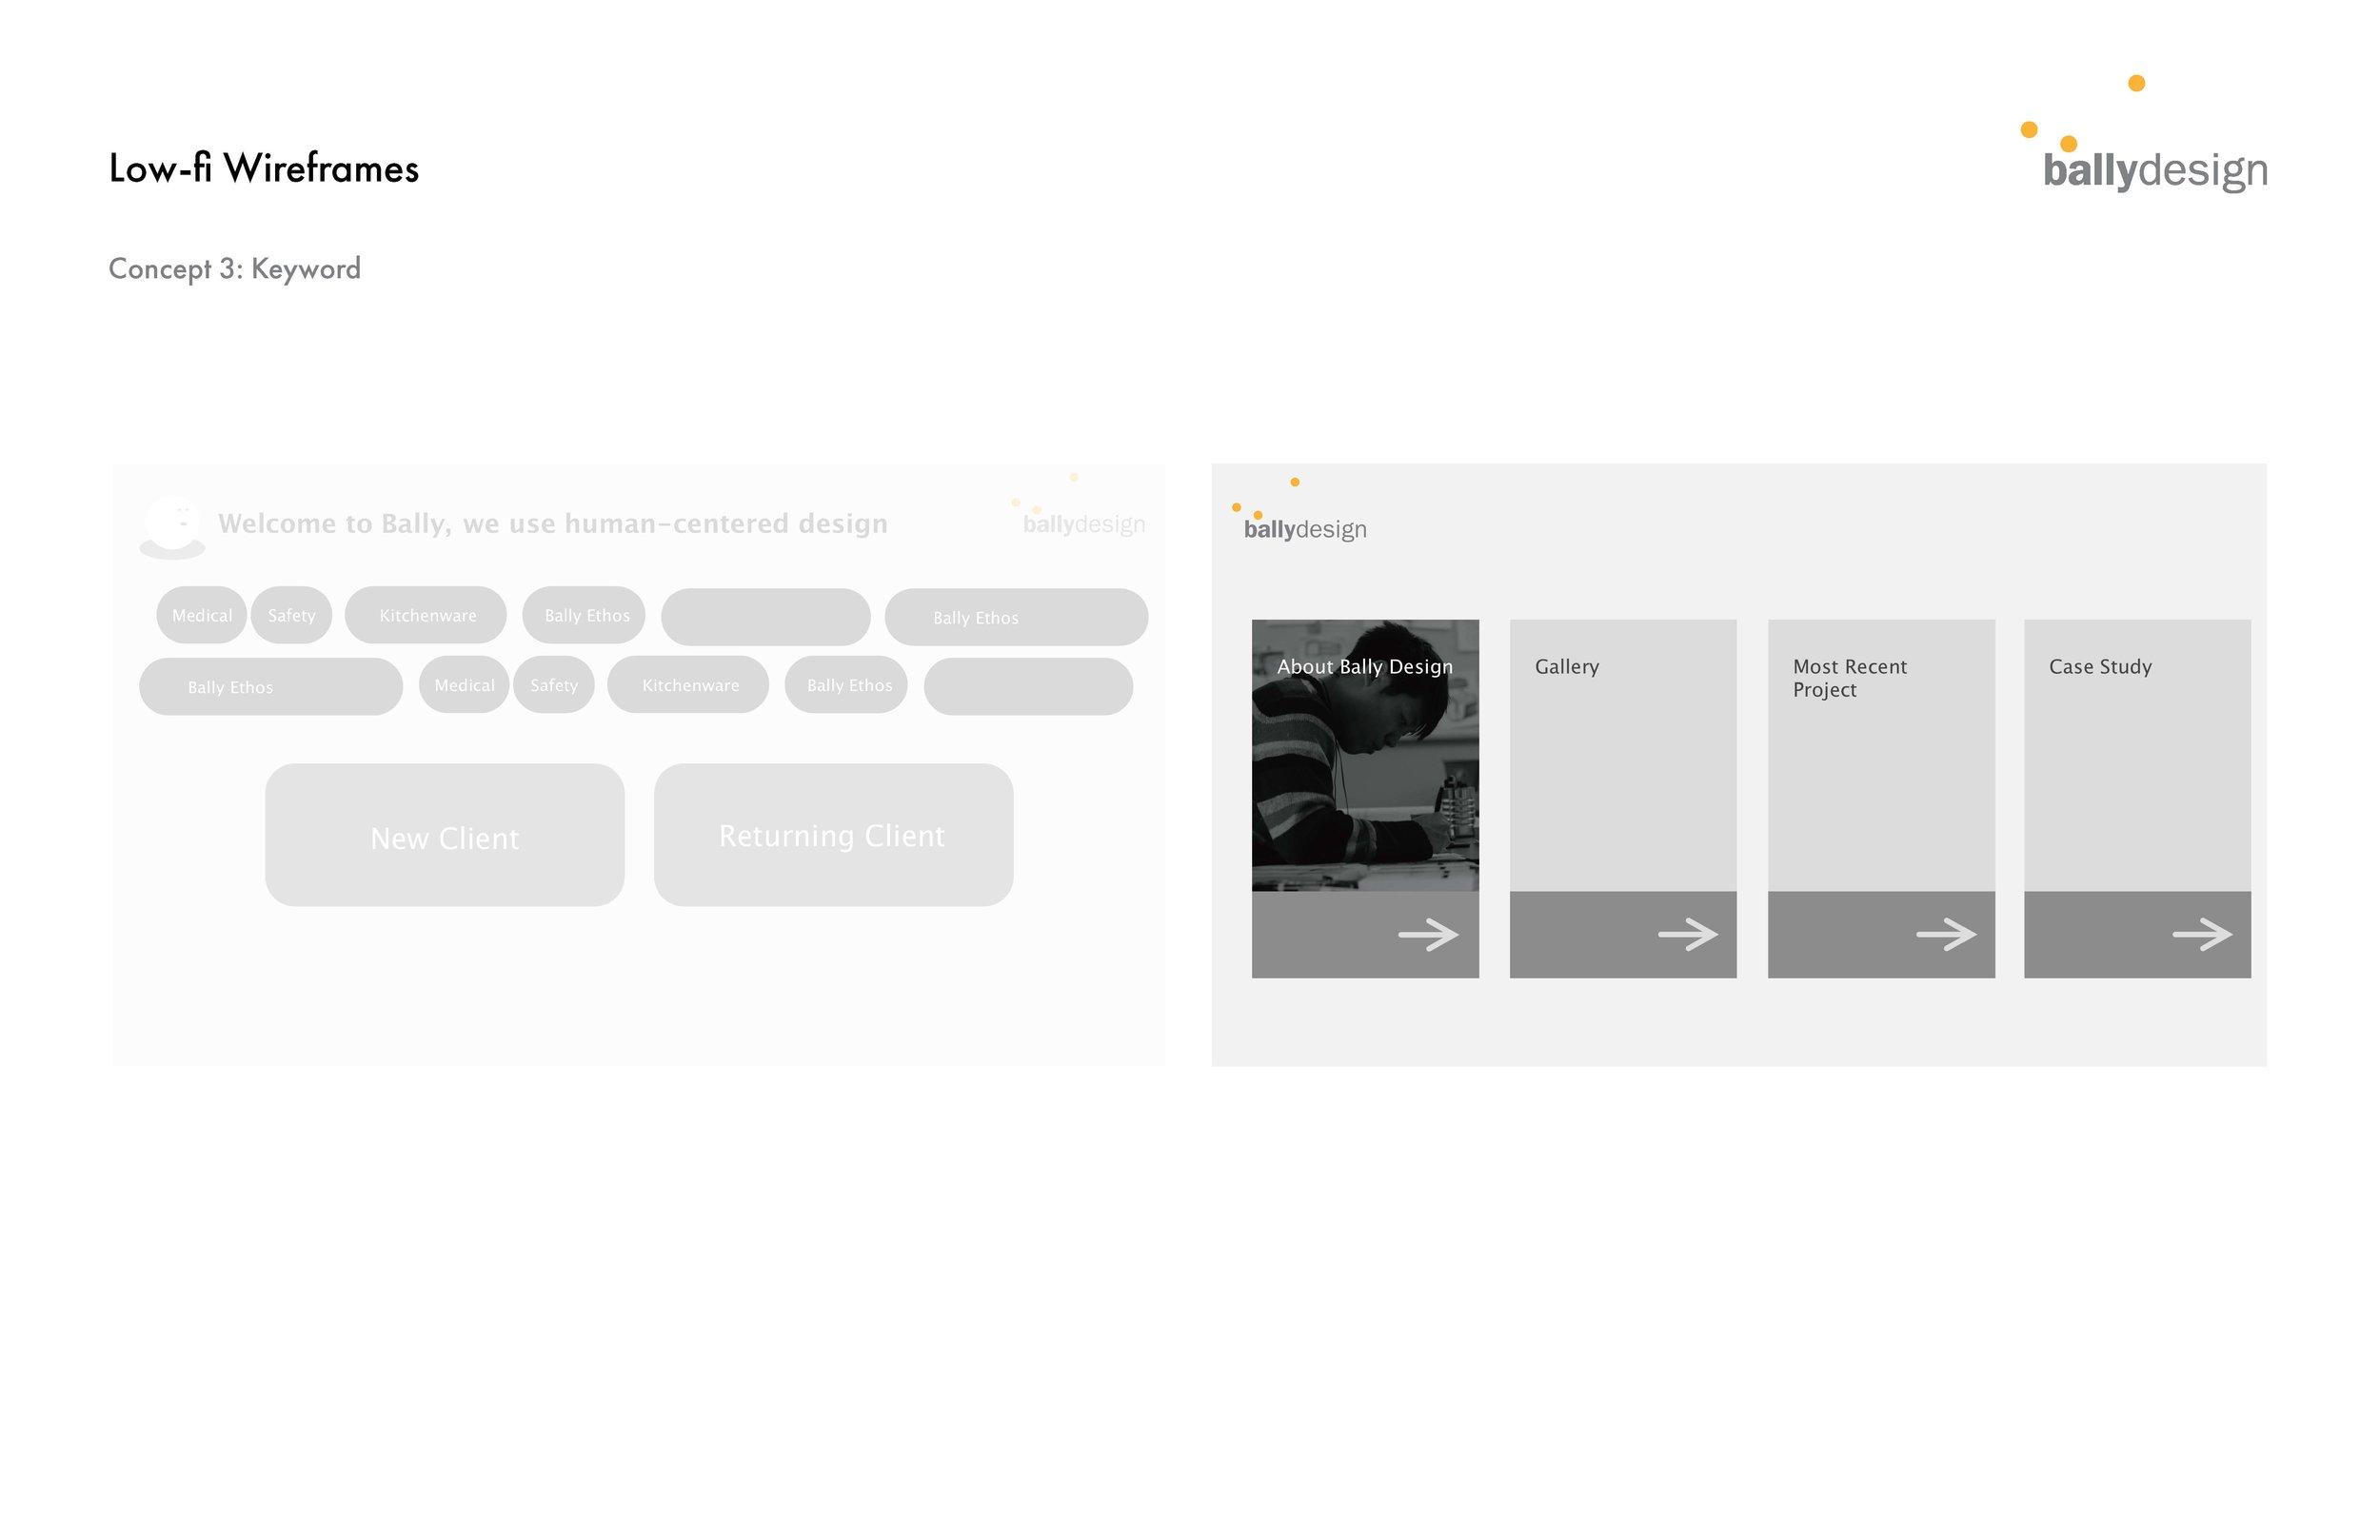 Real_Internship Final Presentation_Page_62.jpg